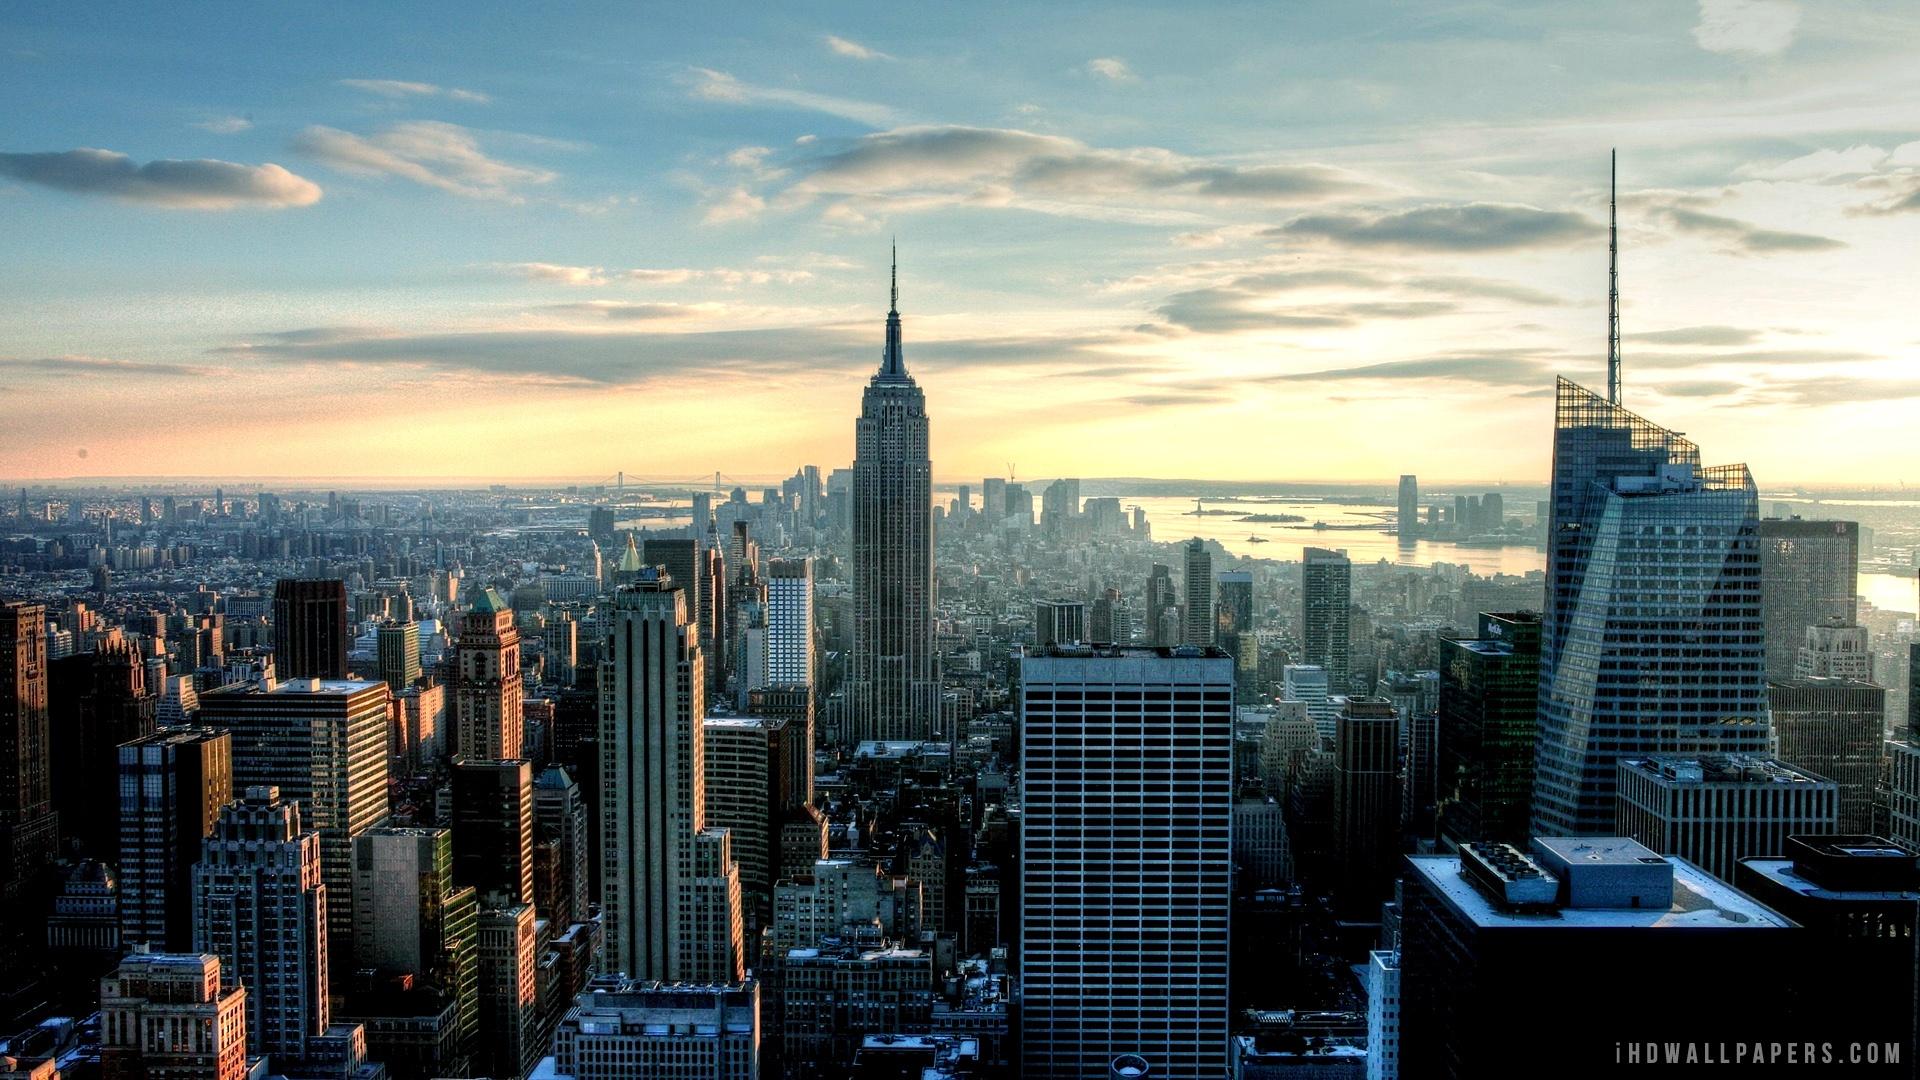 Download New York City WallpaperBackground in 1920x1080 HD 1920x1080